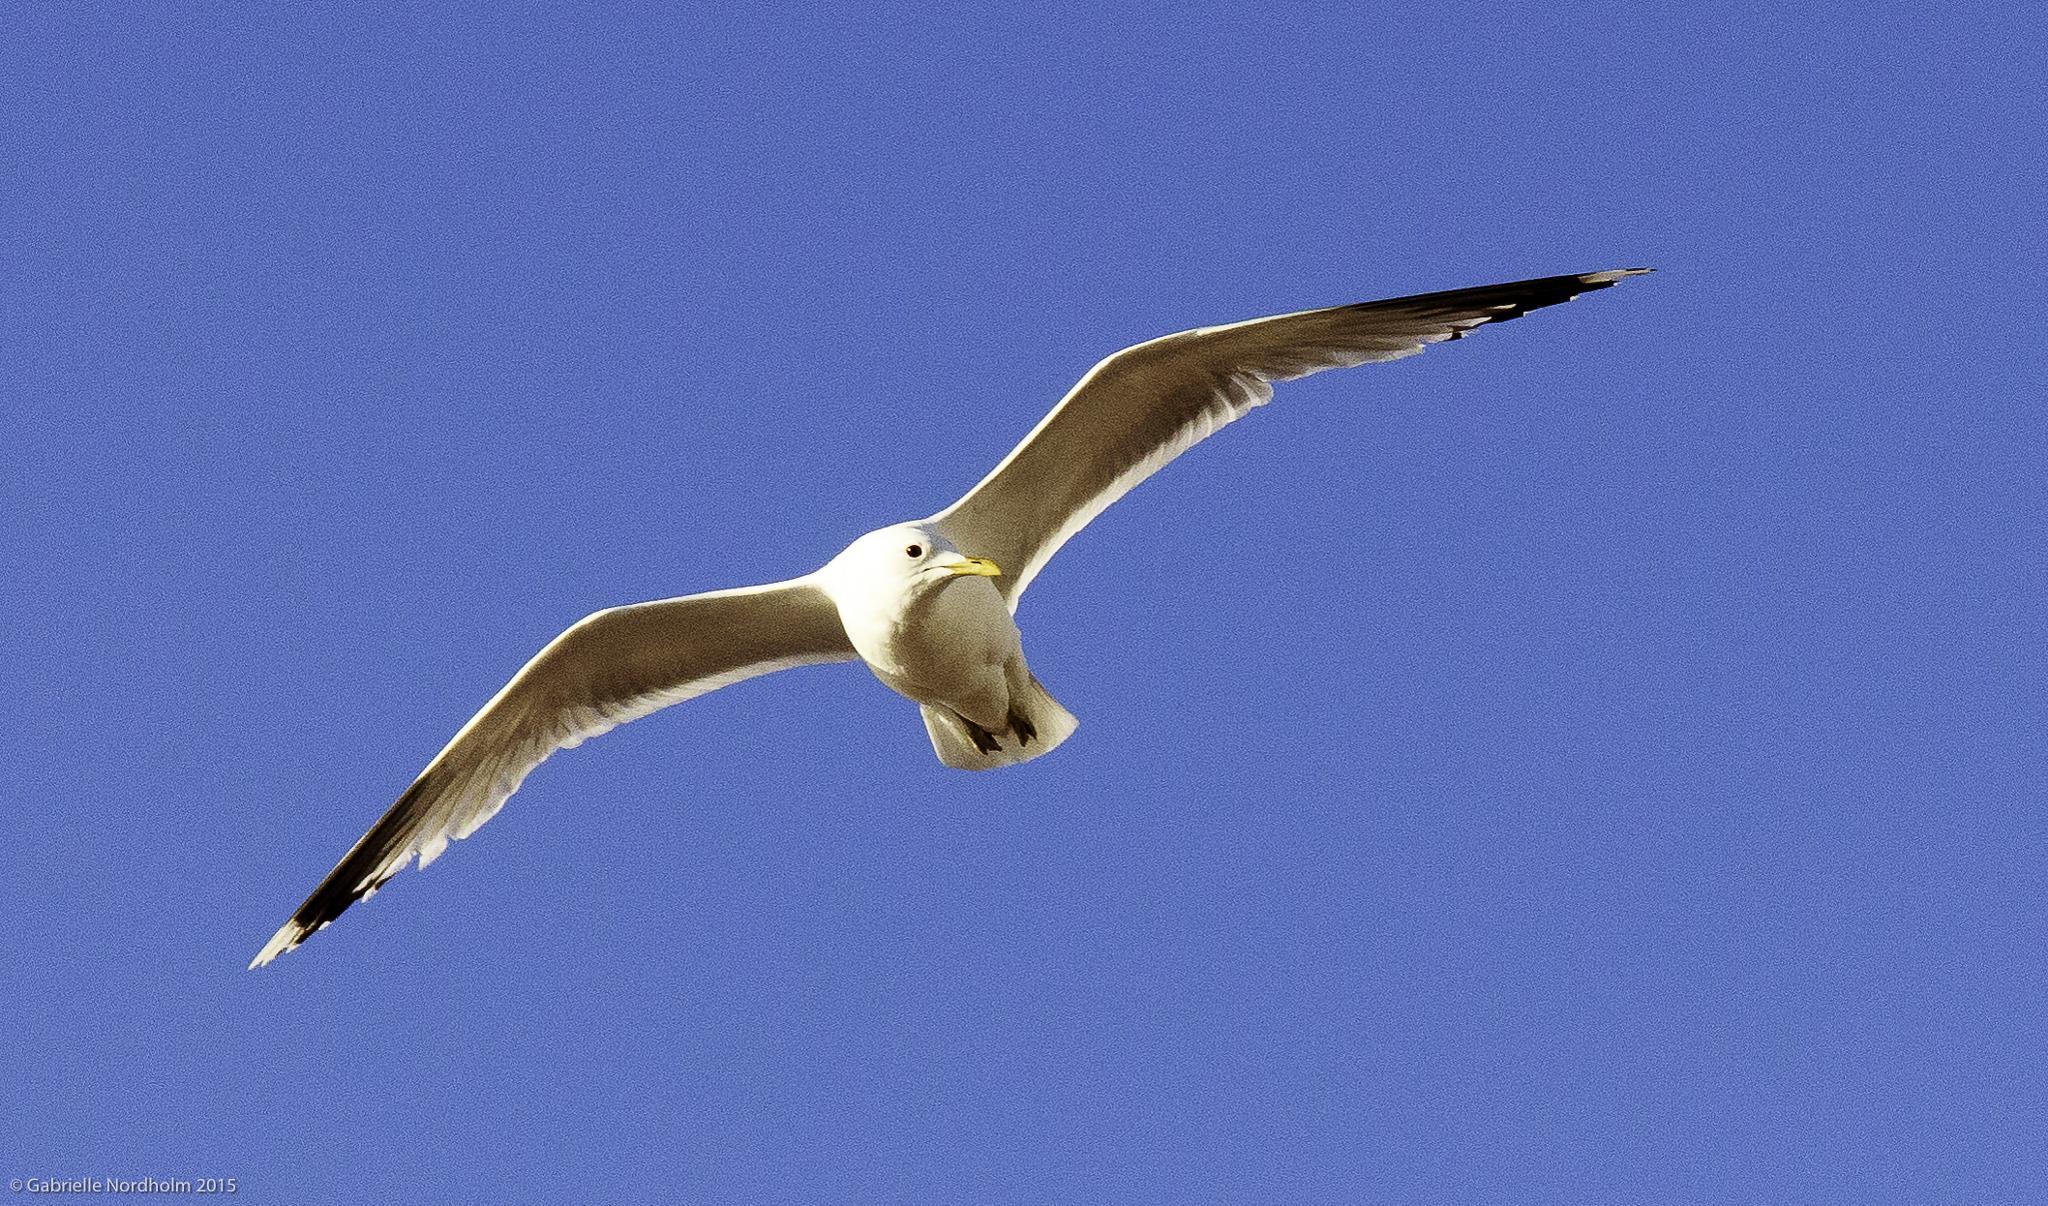 Free like a bird by Gabino